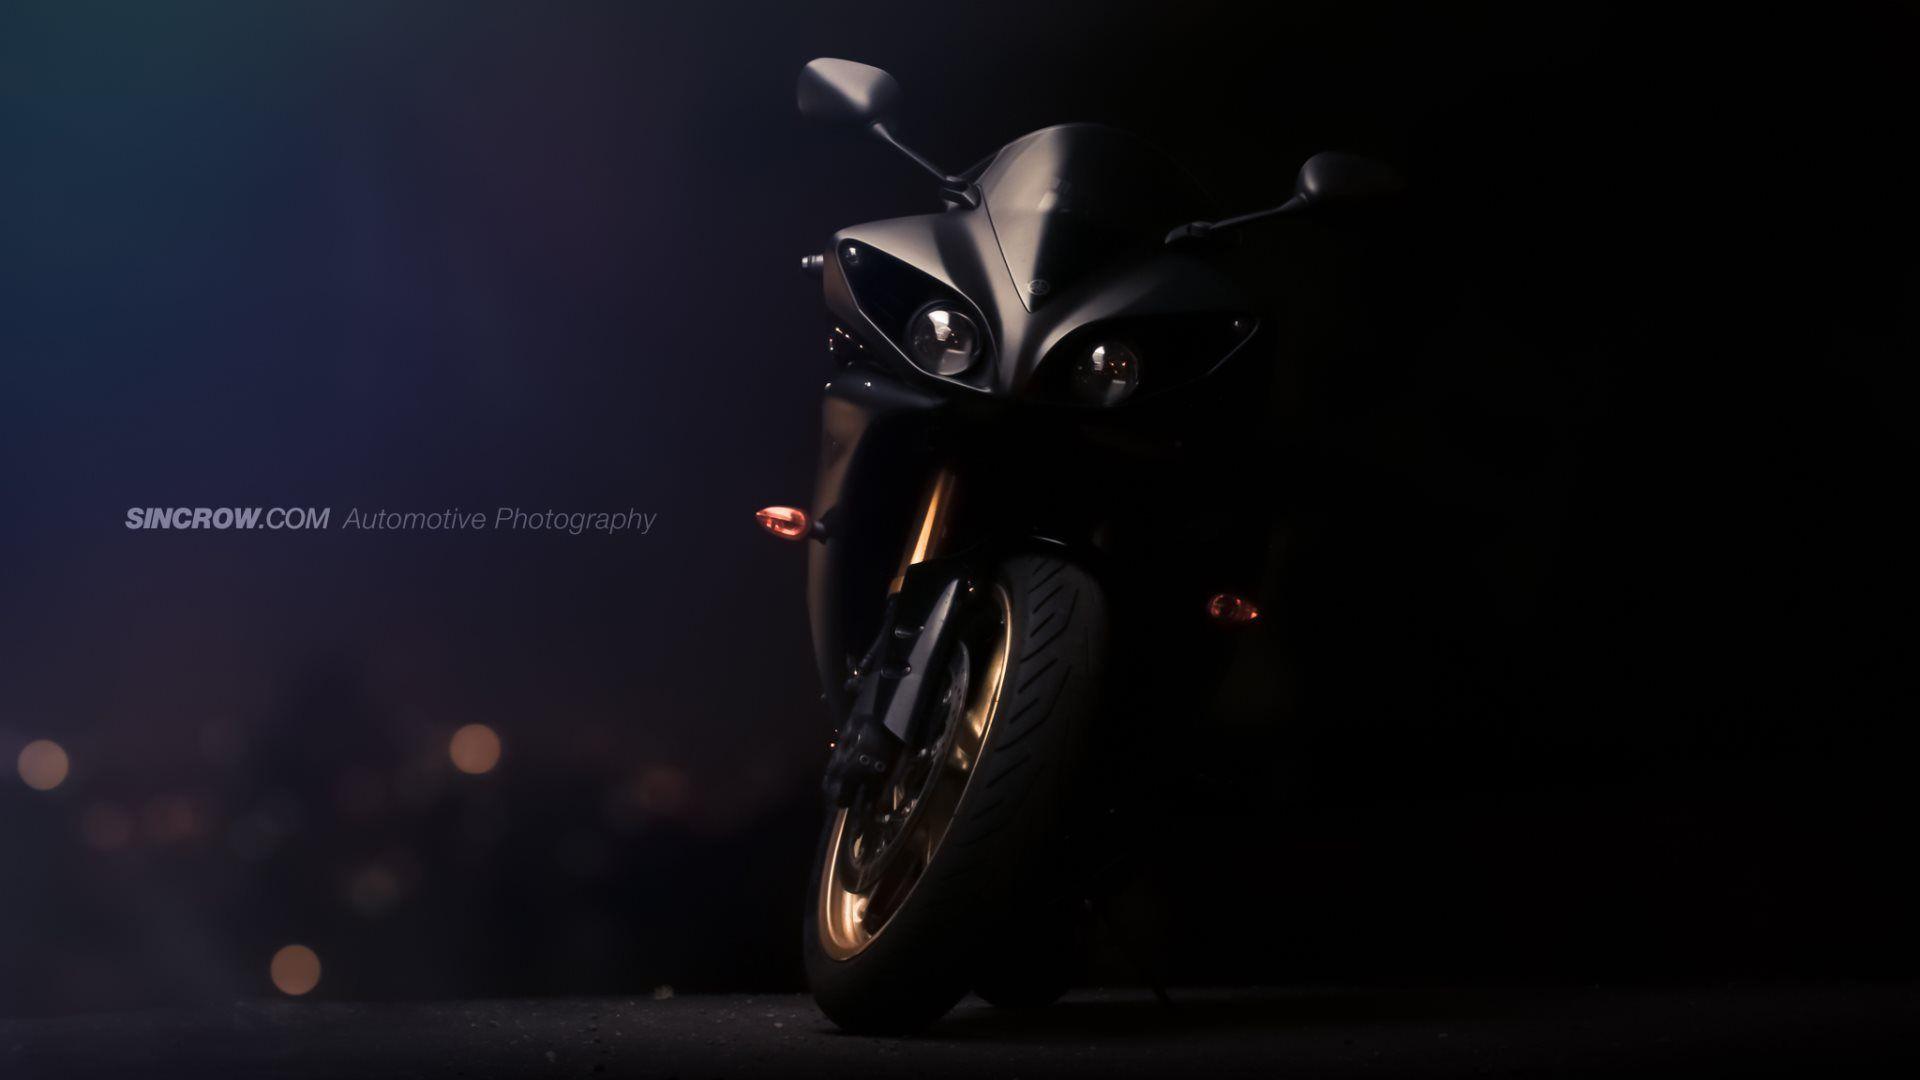 Yamaha hd wallpaper